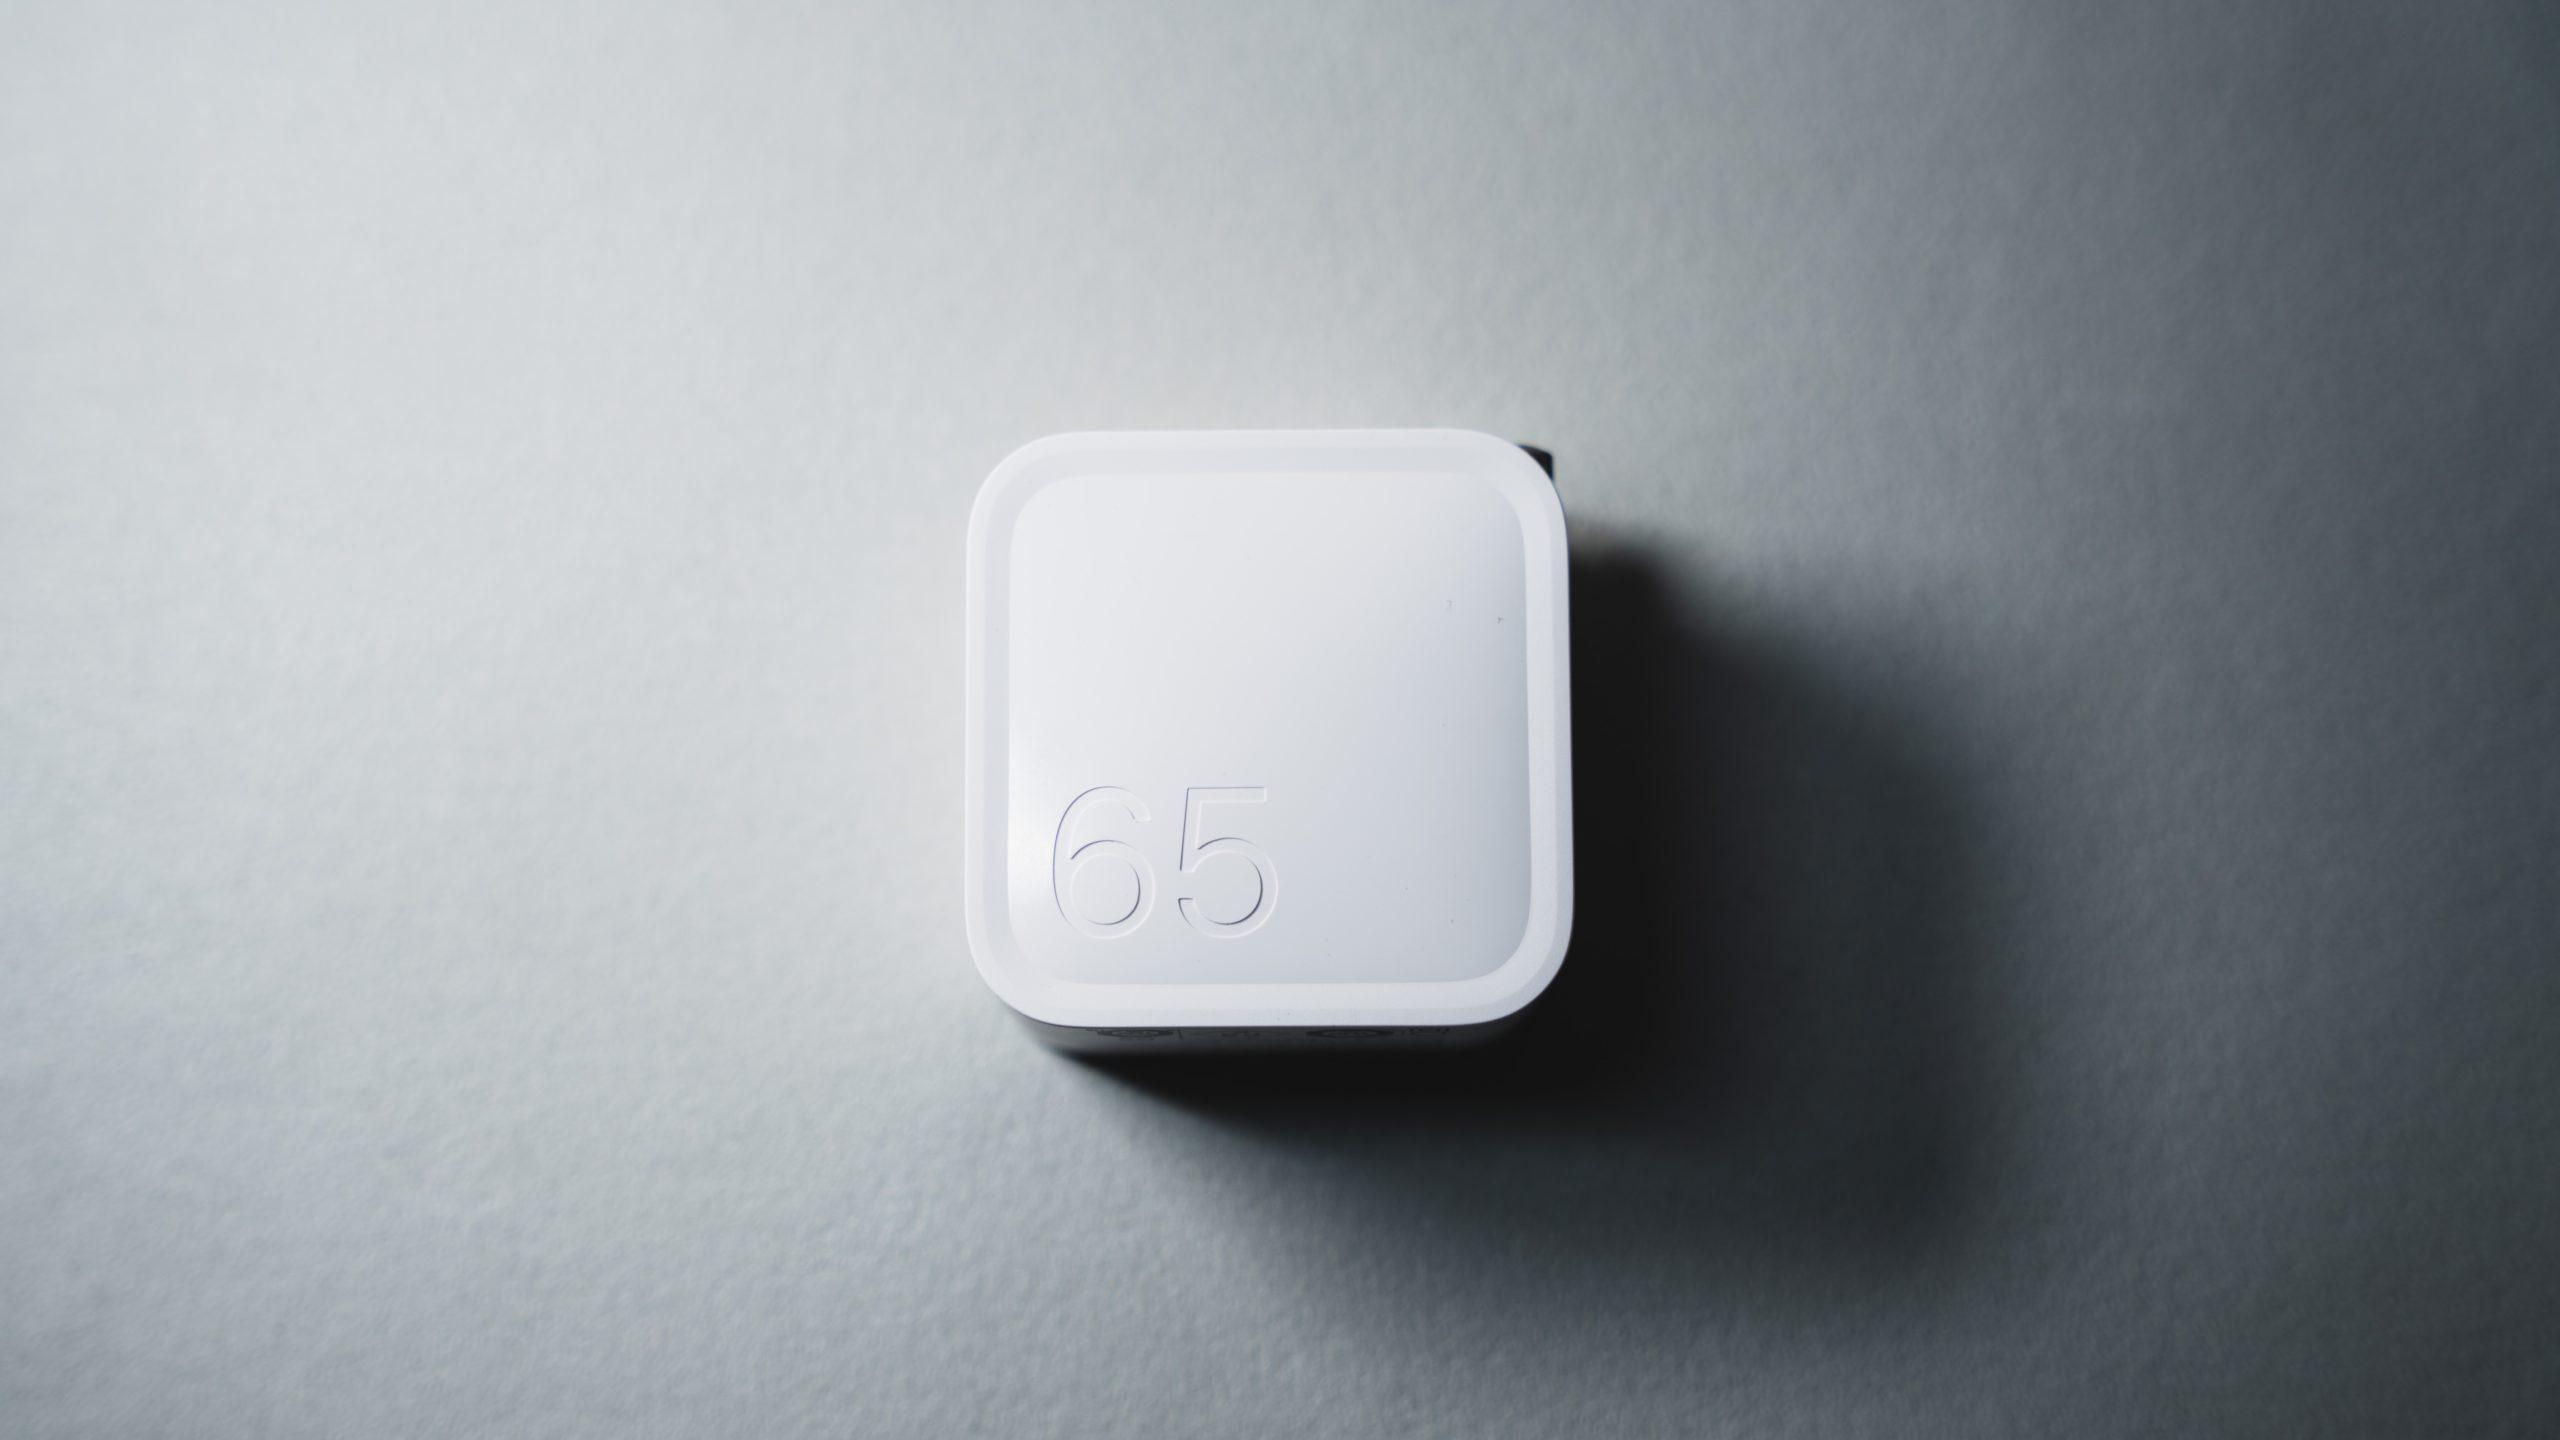 【RAVPOWER RP-PC133】Macbookユーザーは必携のコンパクト充電器をレビュー!